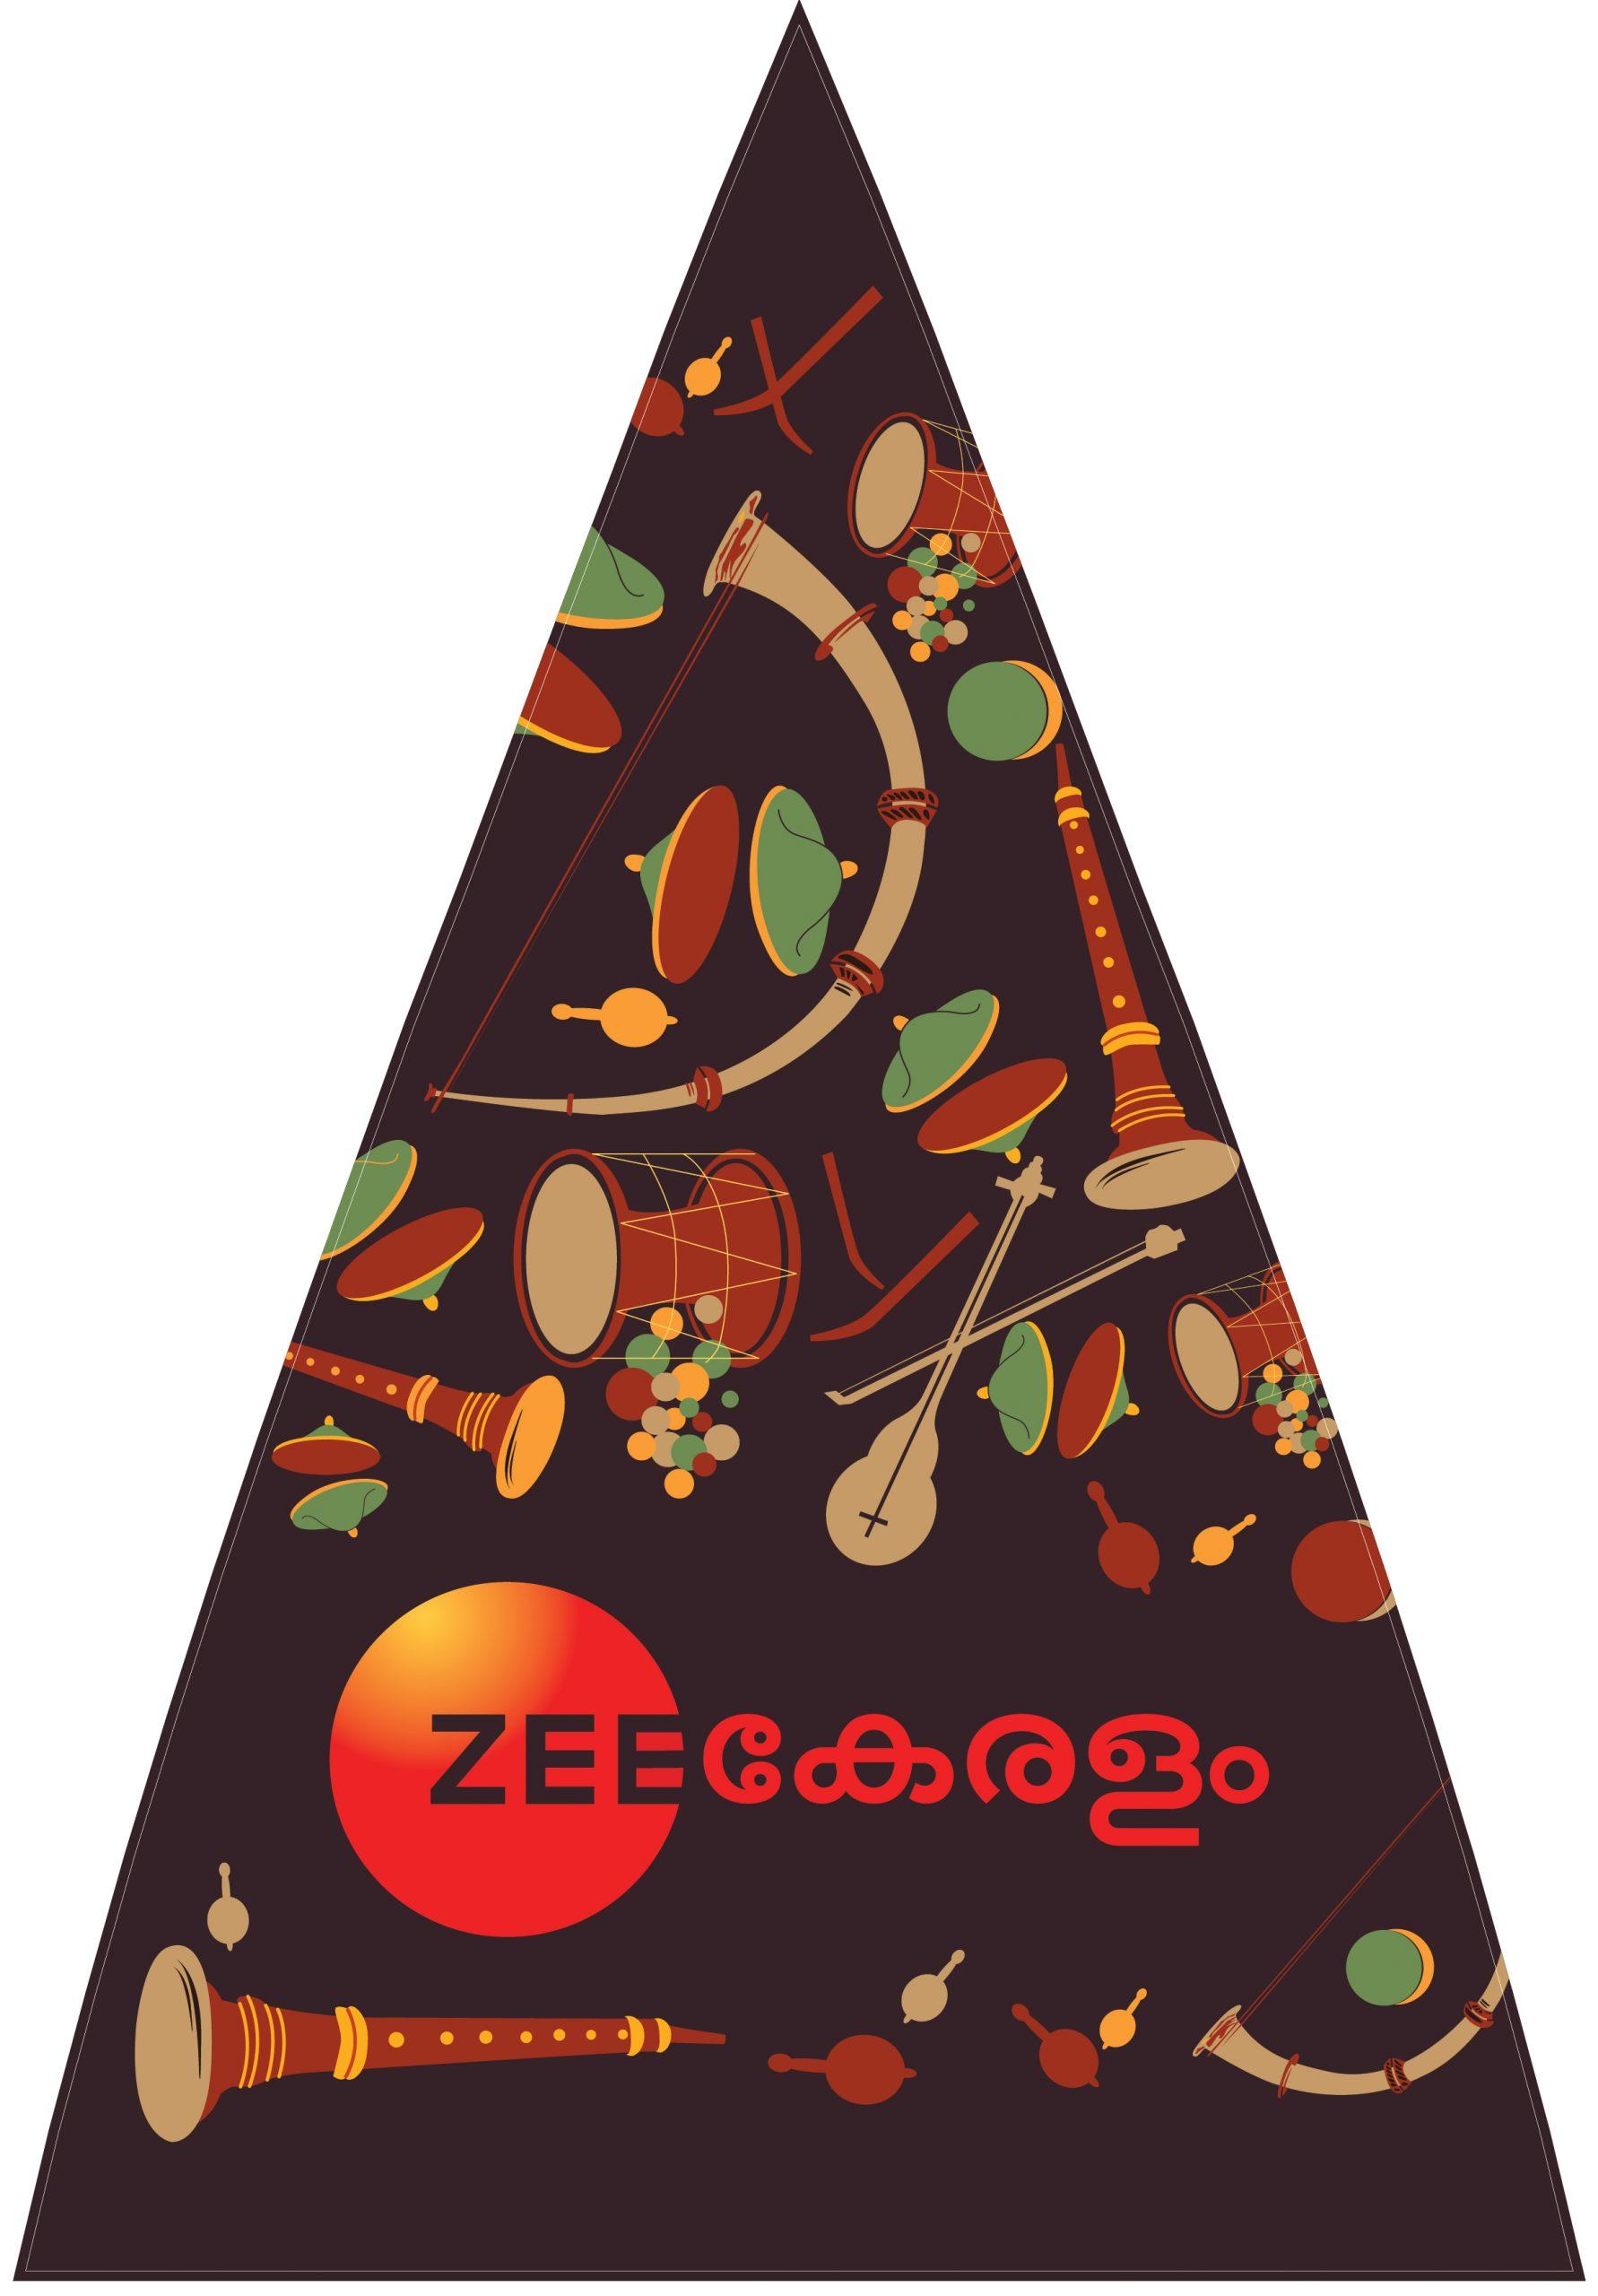 Monsoon Art Umbrella for Zee Keralam | Umbrella mock-up 3 by Stark Communications Pvt Ltd